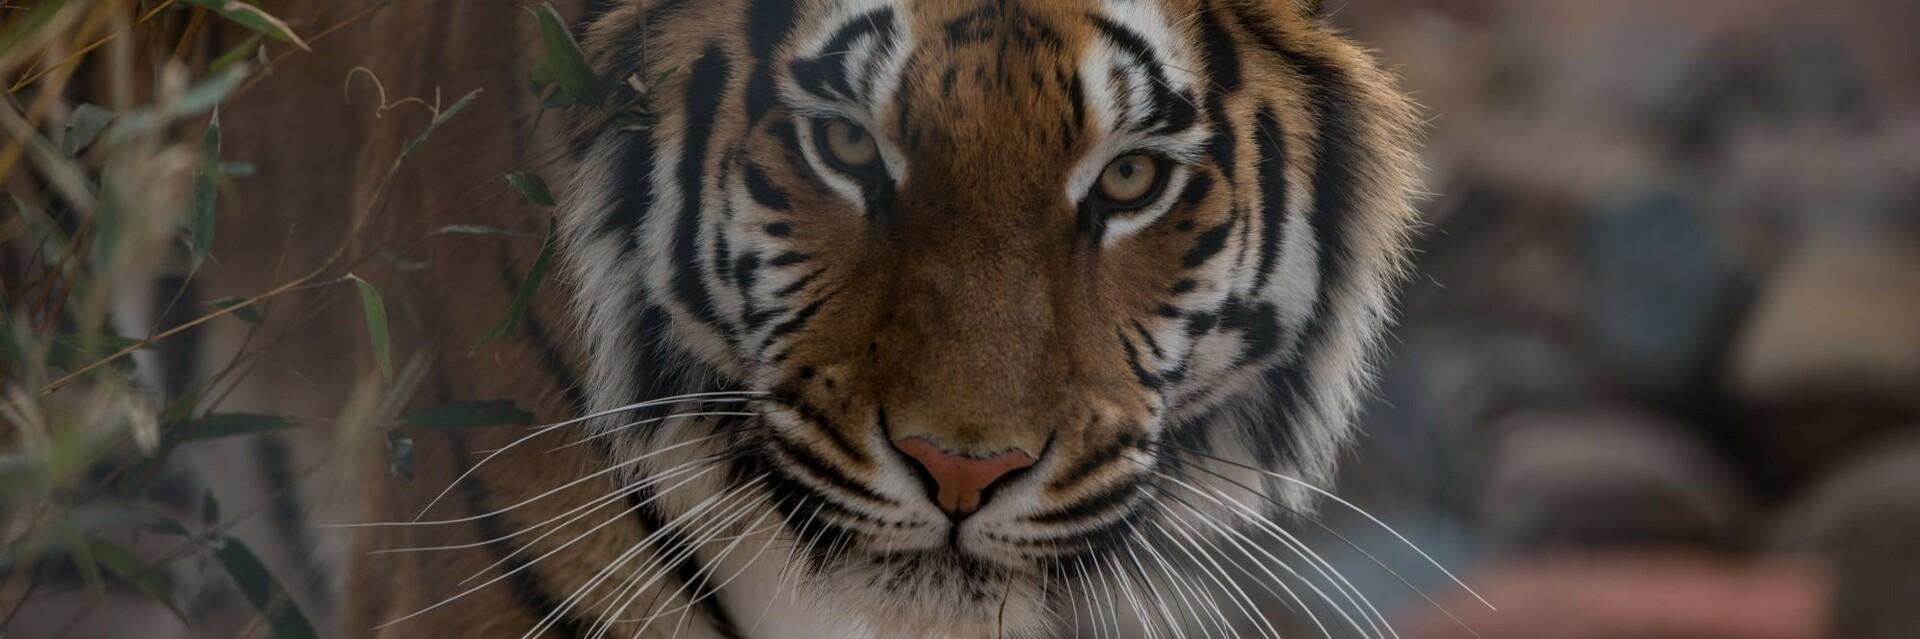 Tigerdame Cara bei TIERART